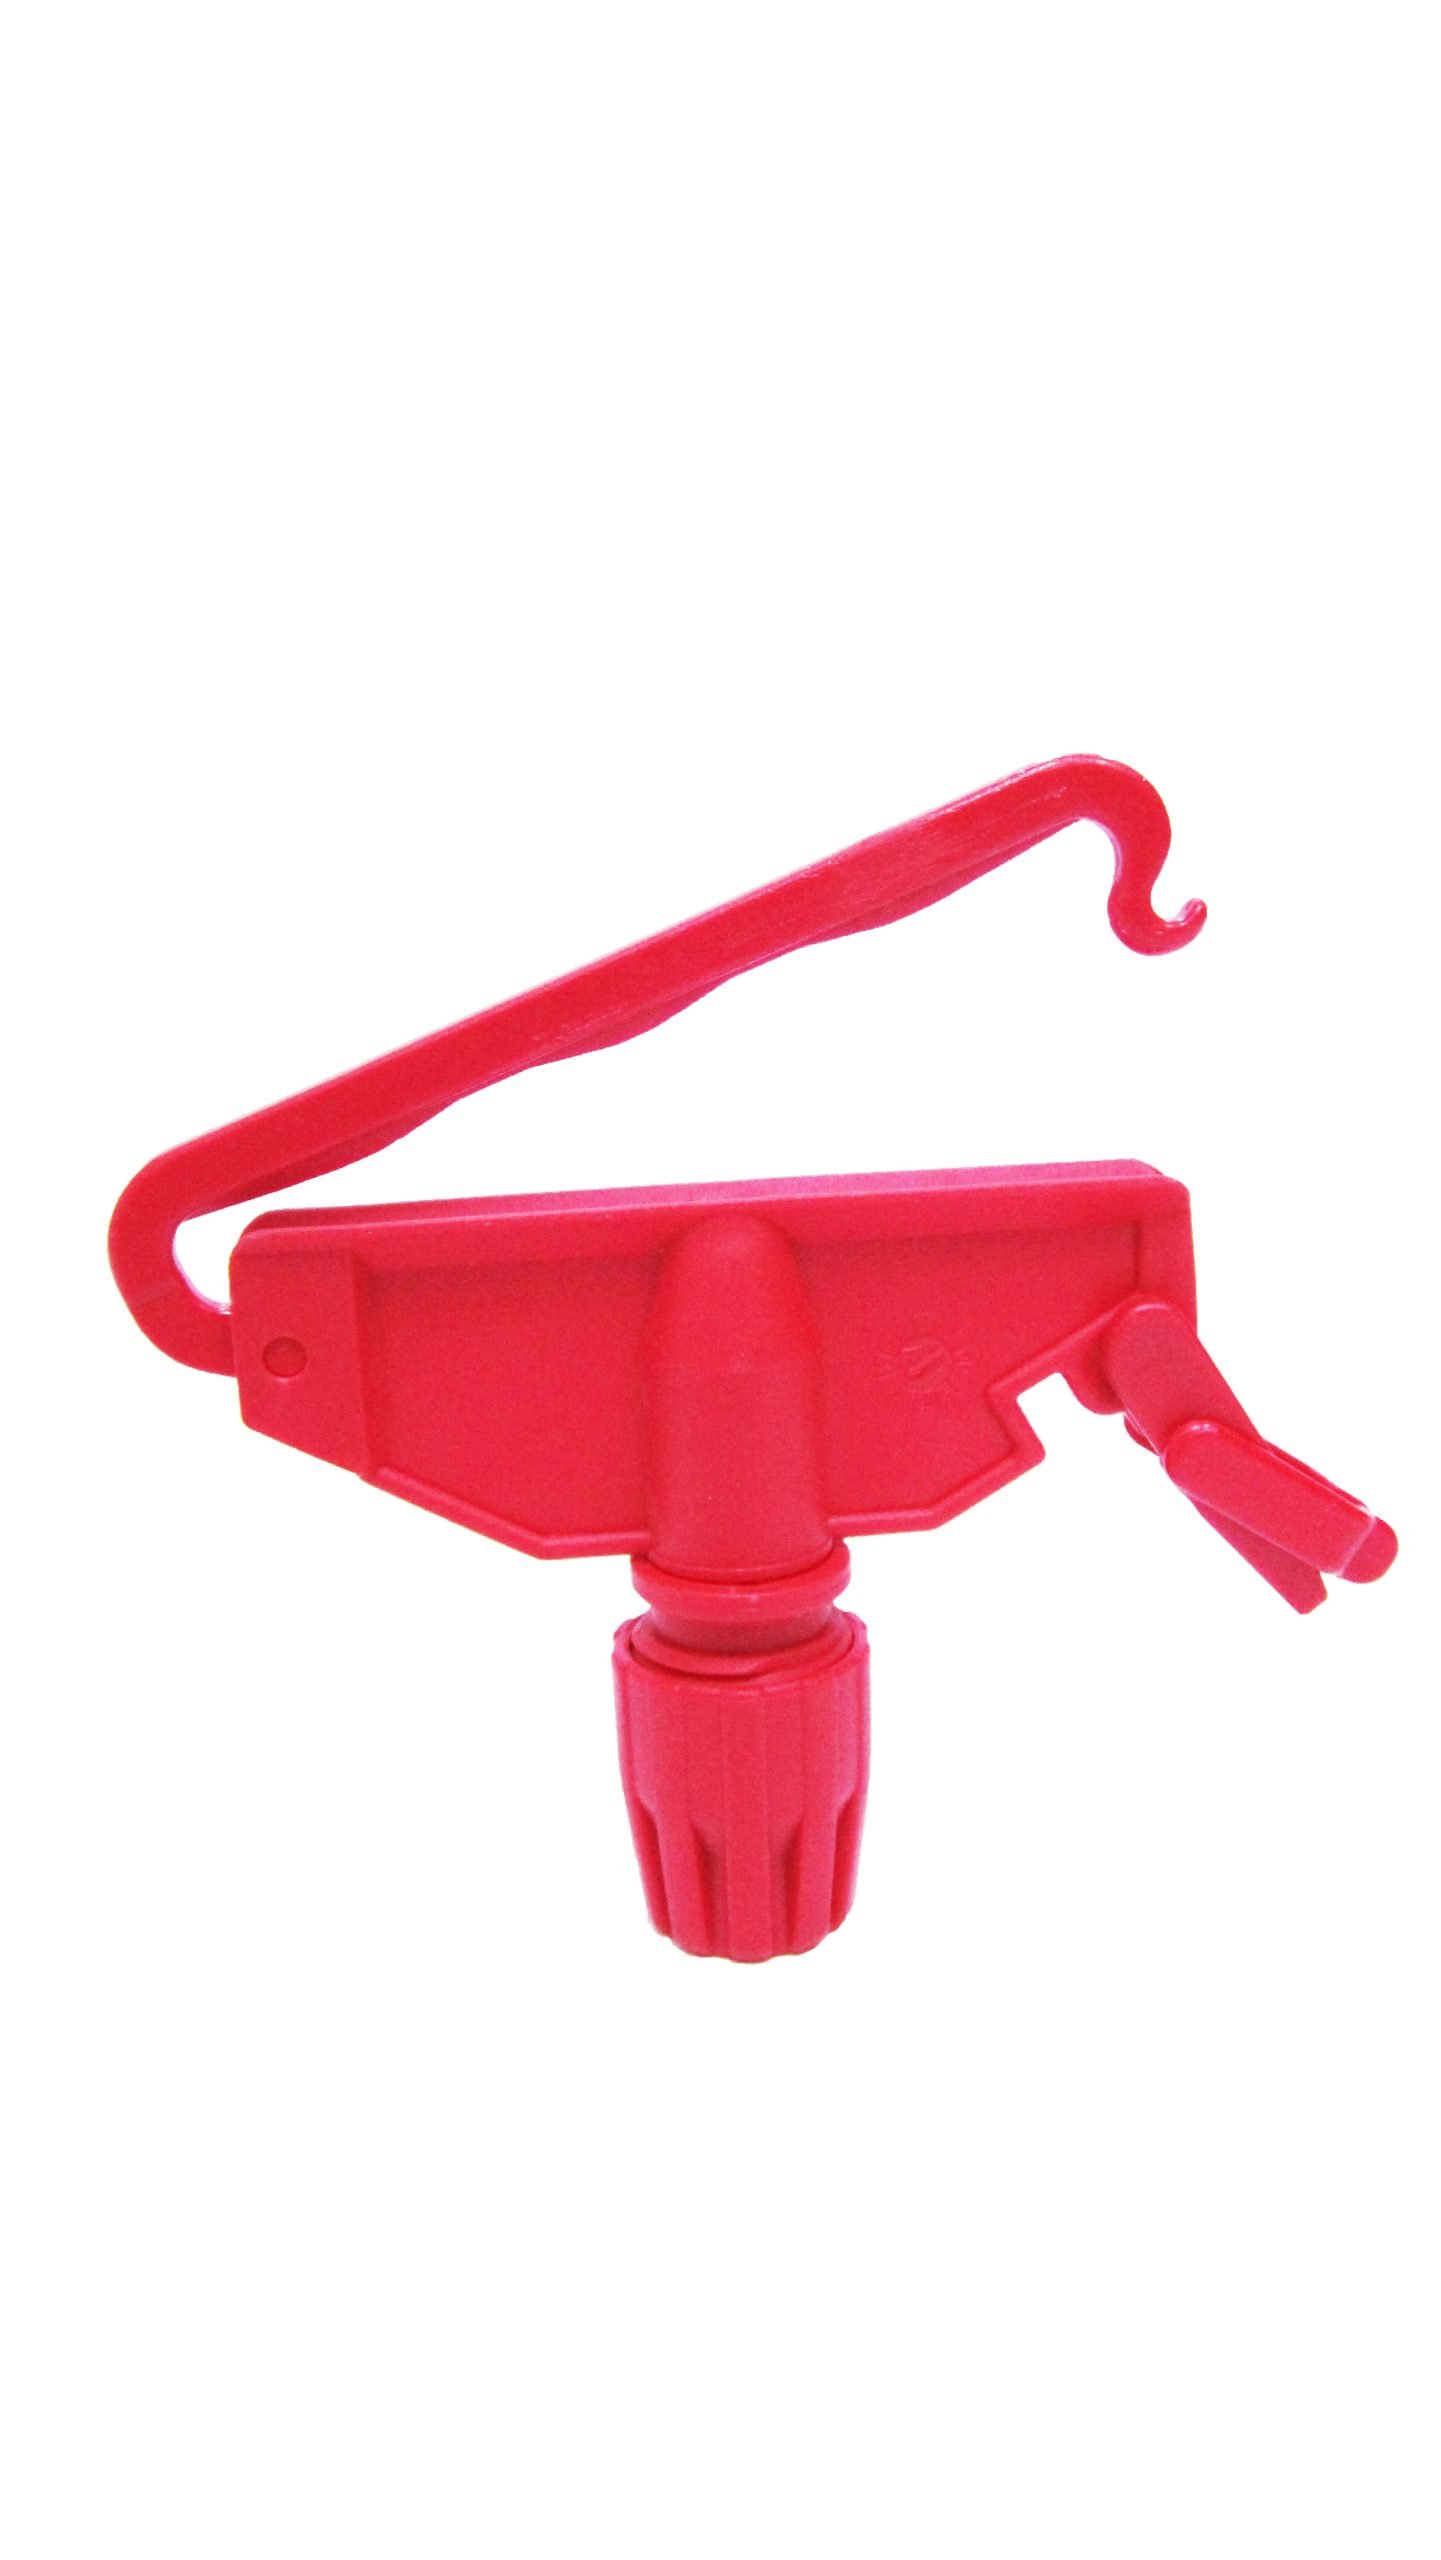 Ipc Plastic Mop Holder Mpvr94539/ 0002